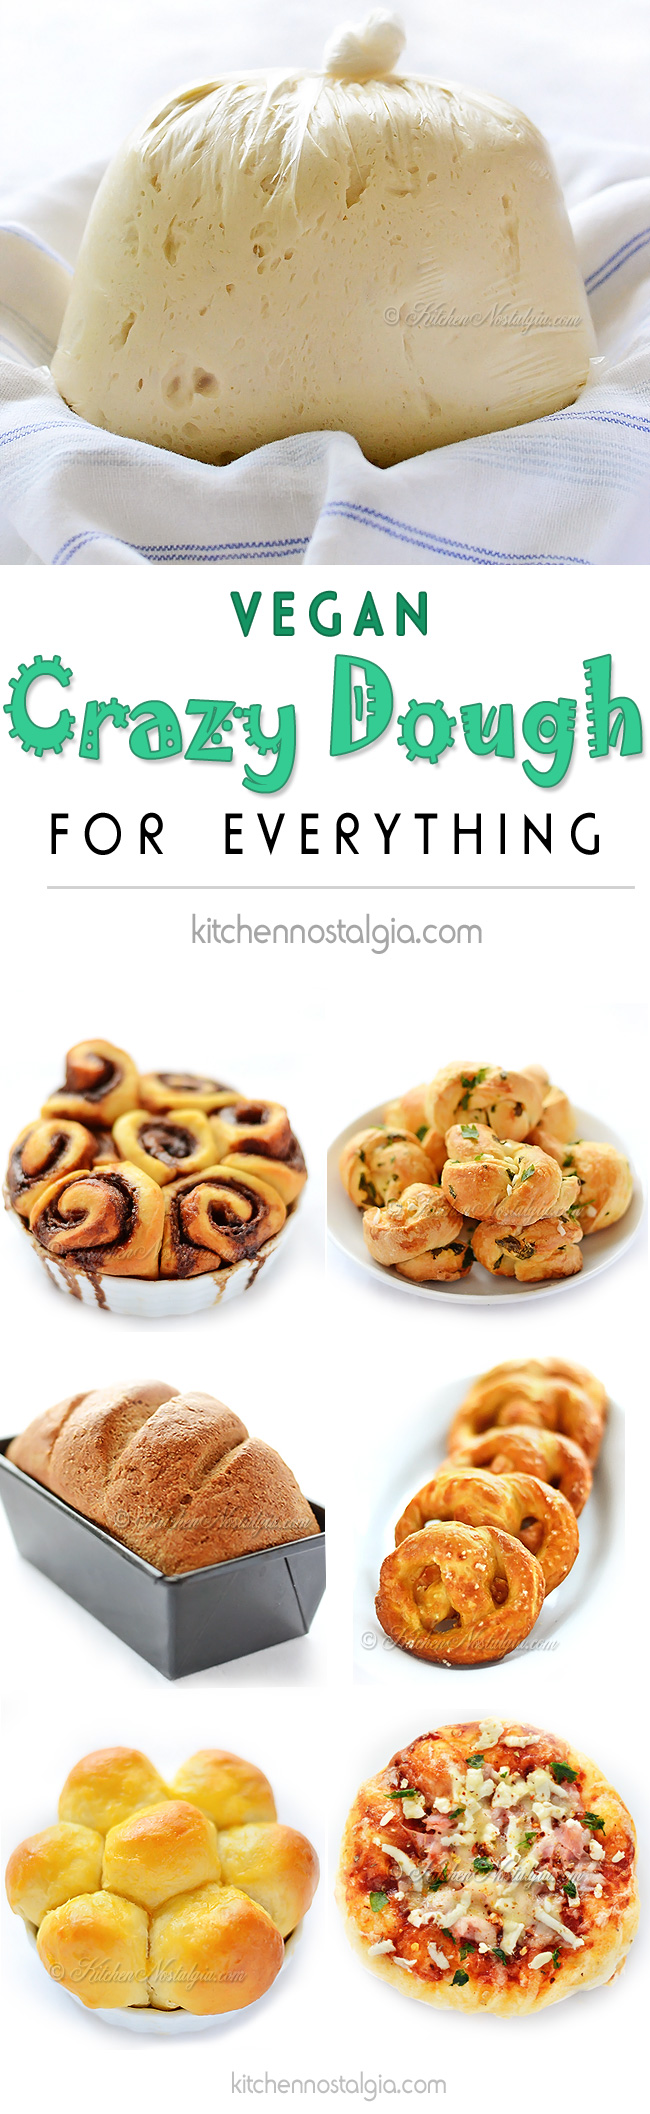 Vegan Crazy Dough - kitchennostalgia.com